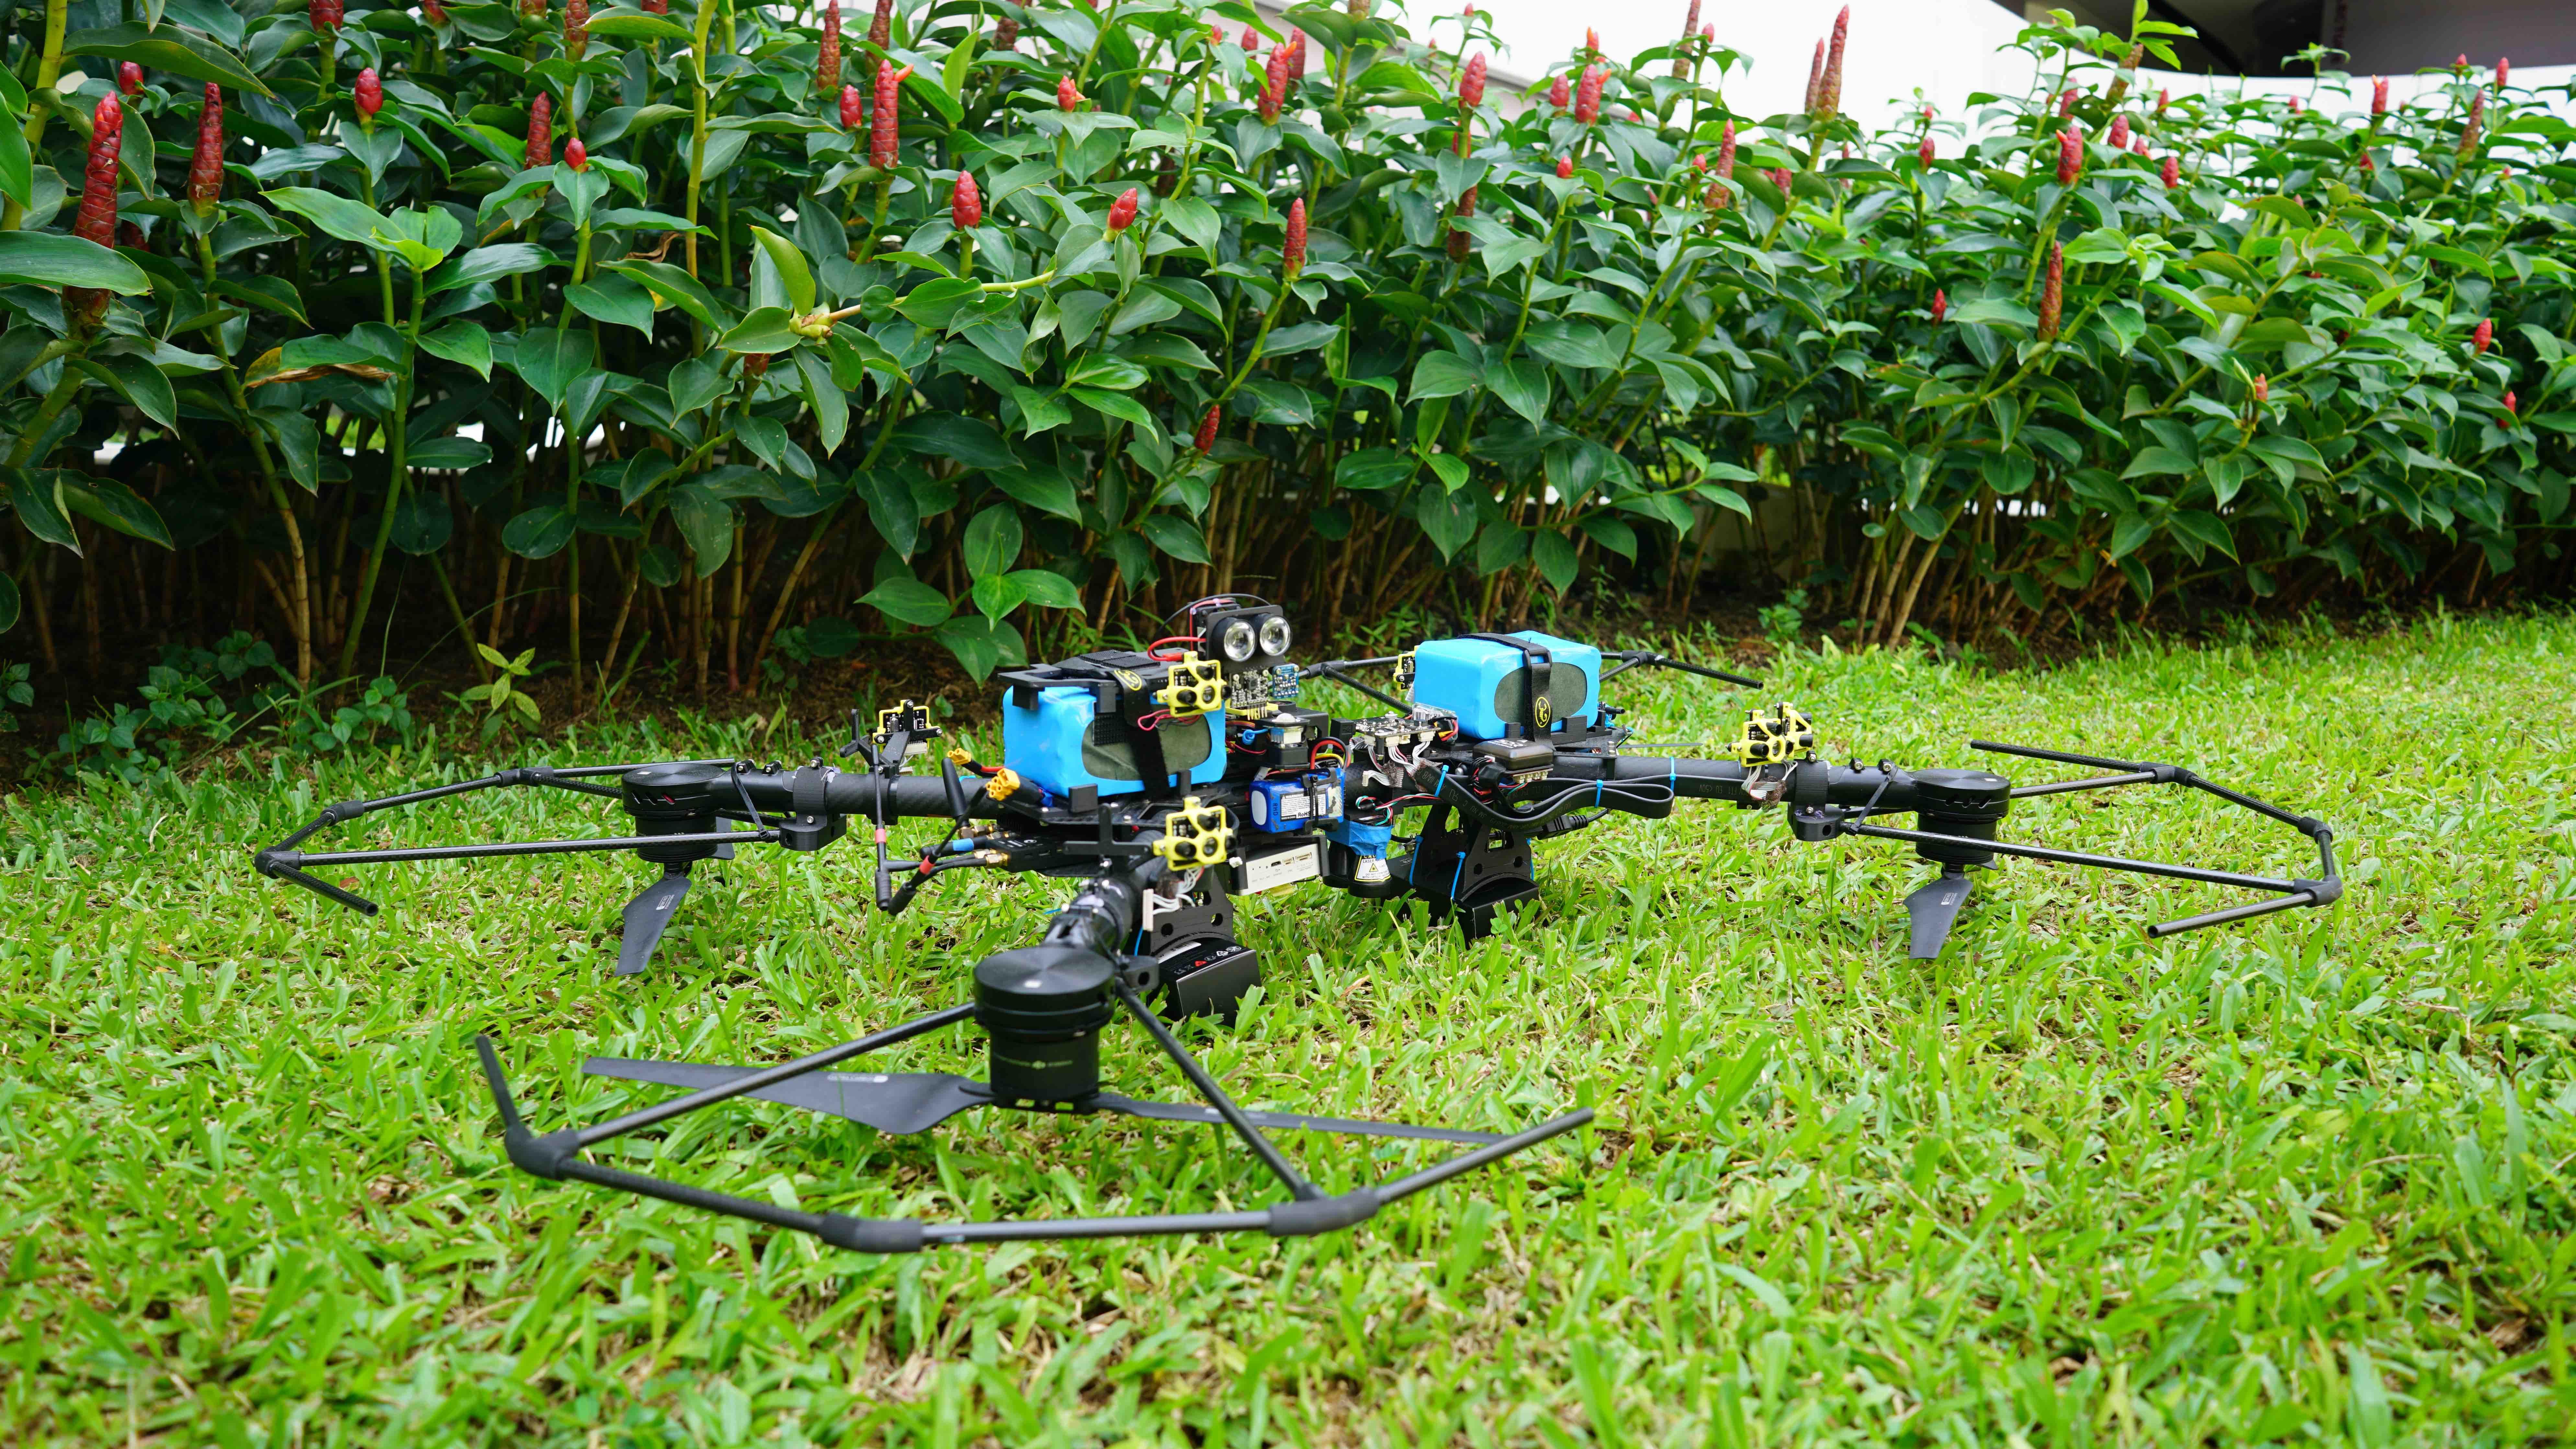 SWIRL: Surveyor With Intelligent Rotating Lens